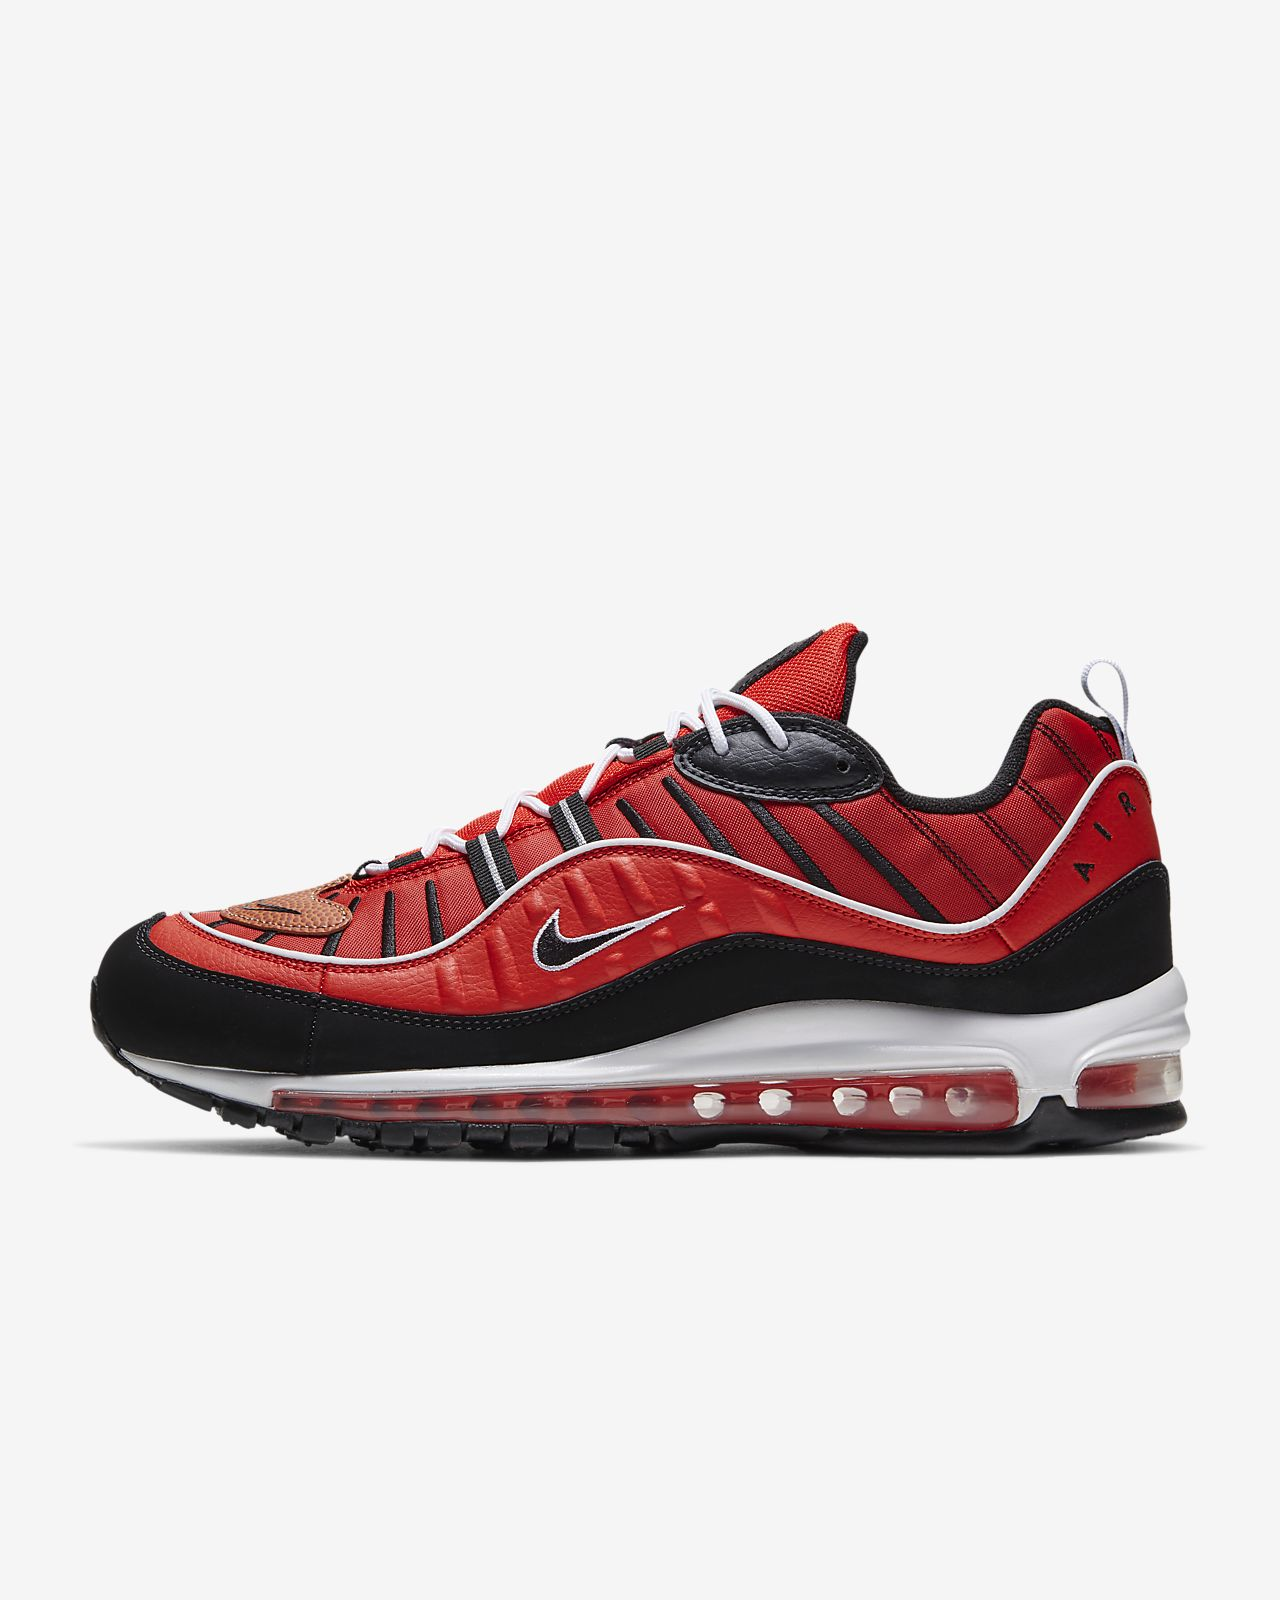 Nike Air Max 98 男子运动鞋